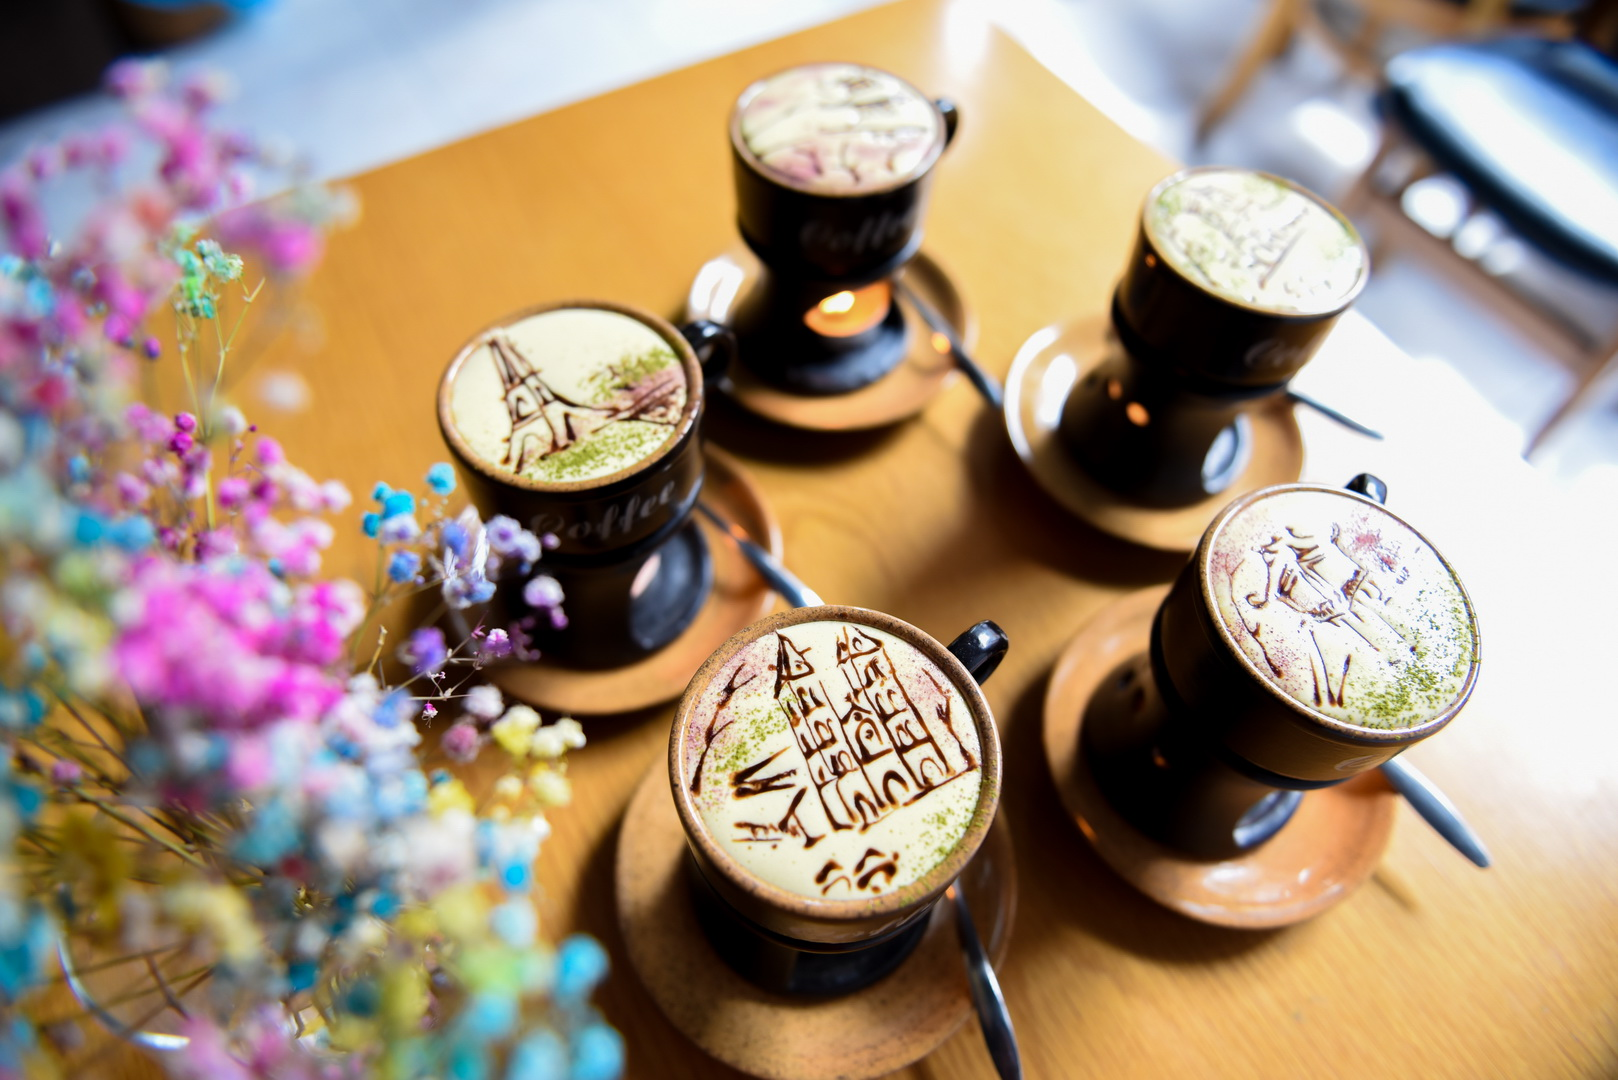 Man draws Vietnam's landmarks on egg coffee